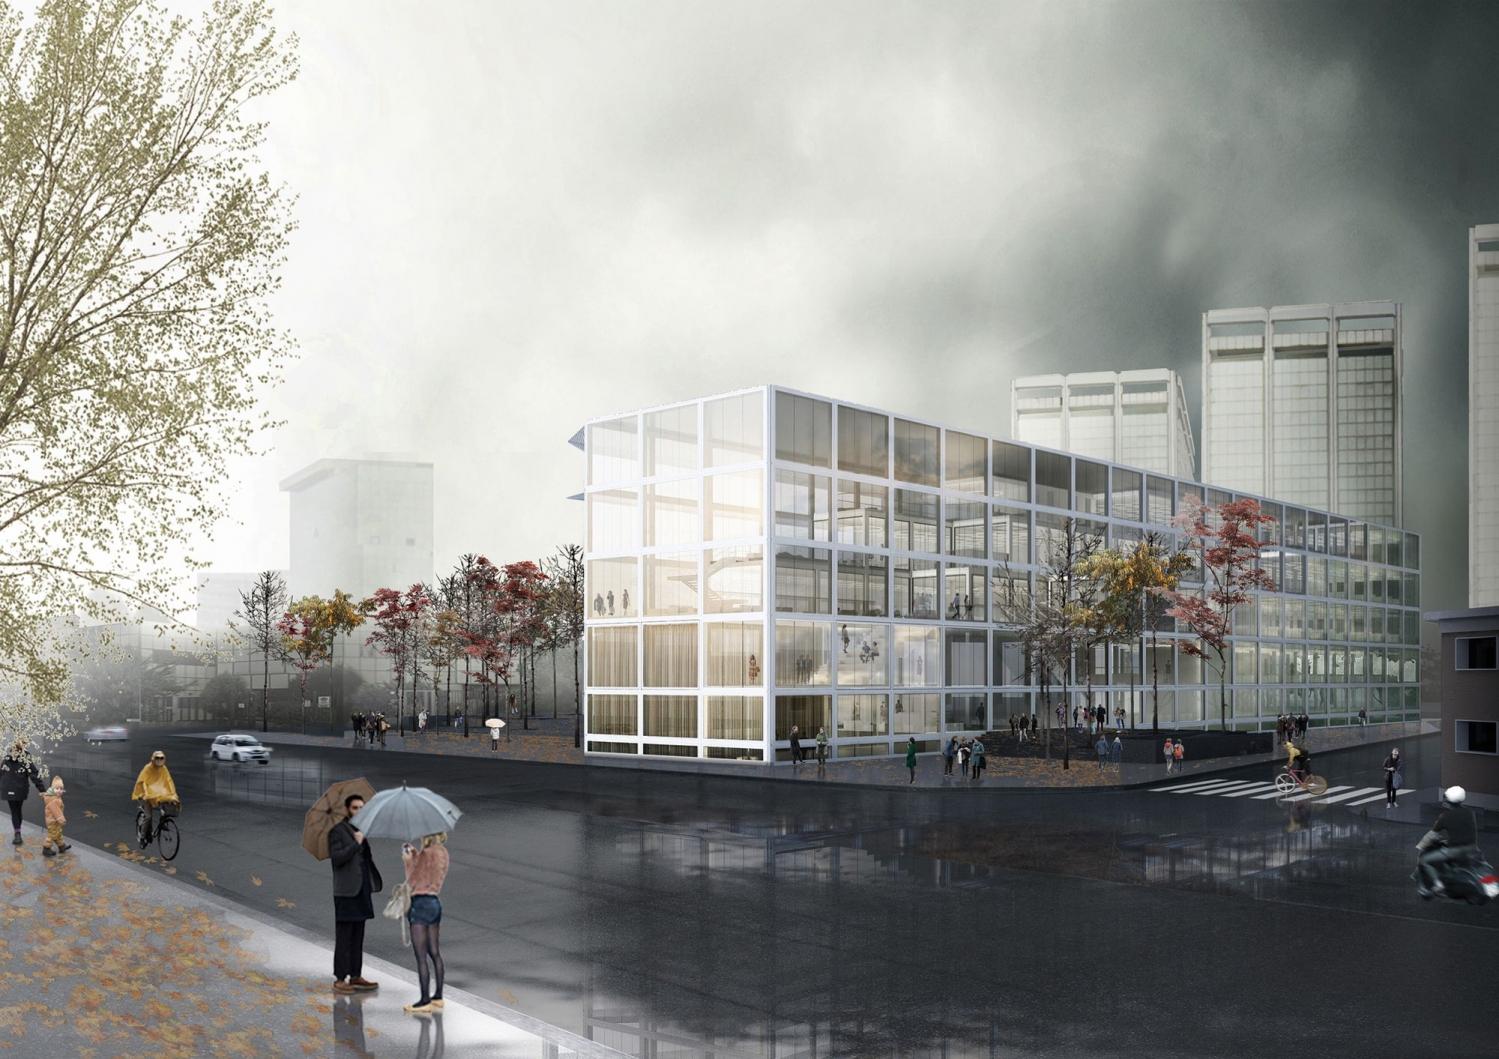 Laboratorio-Permanente-.-Urban-Corner-.-Milan-2.jpg